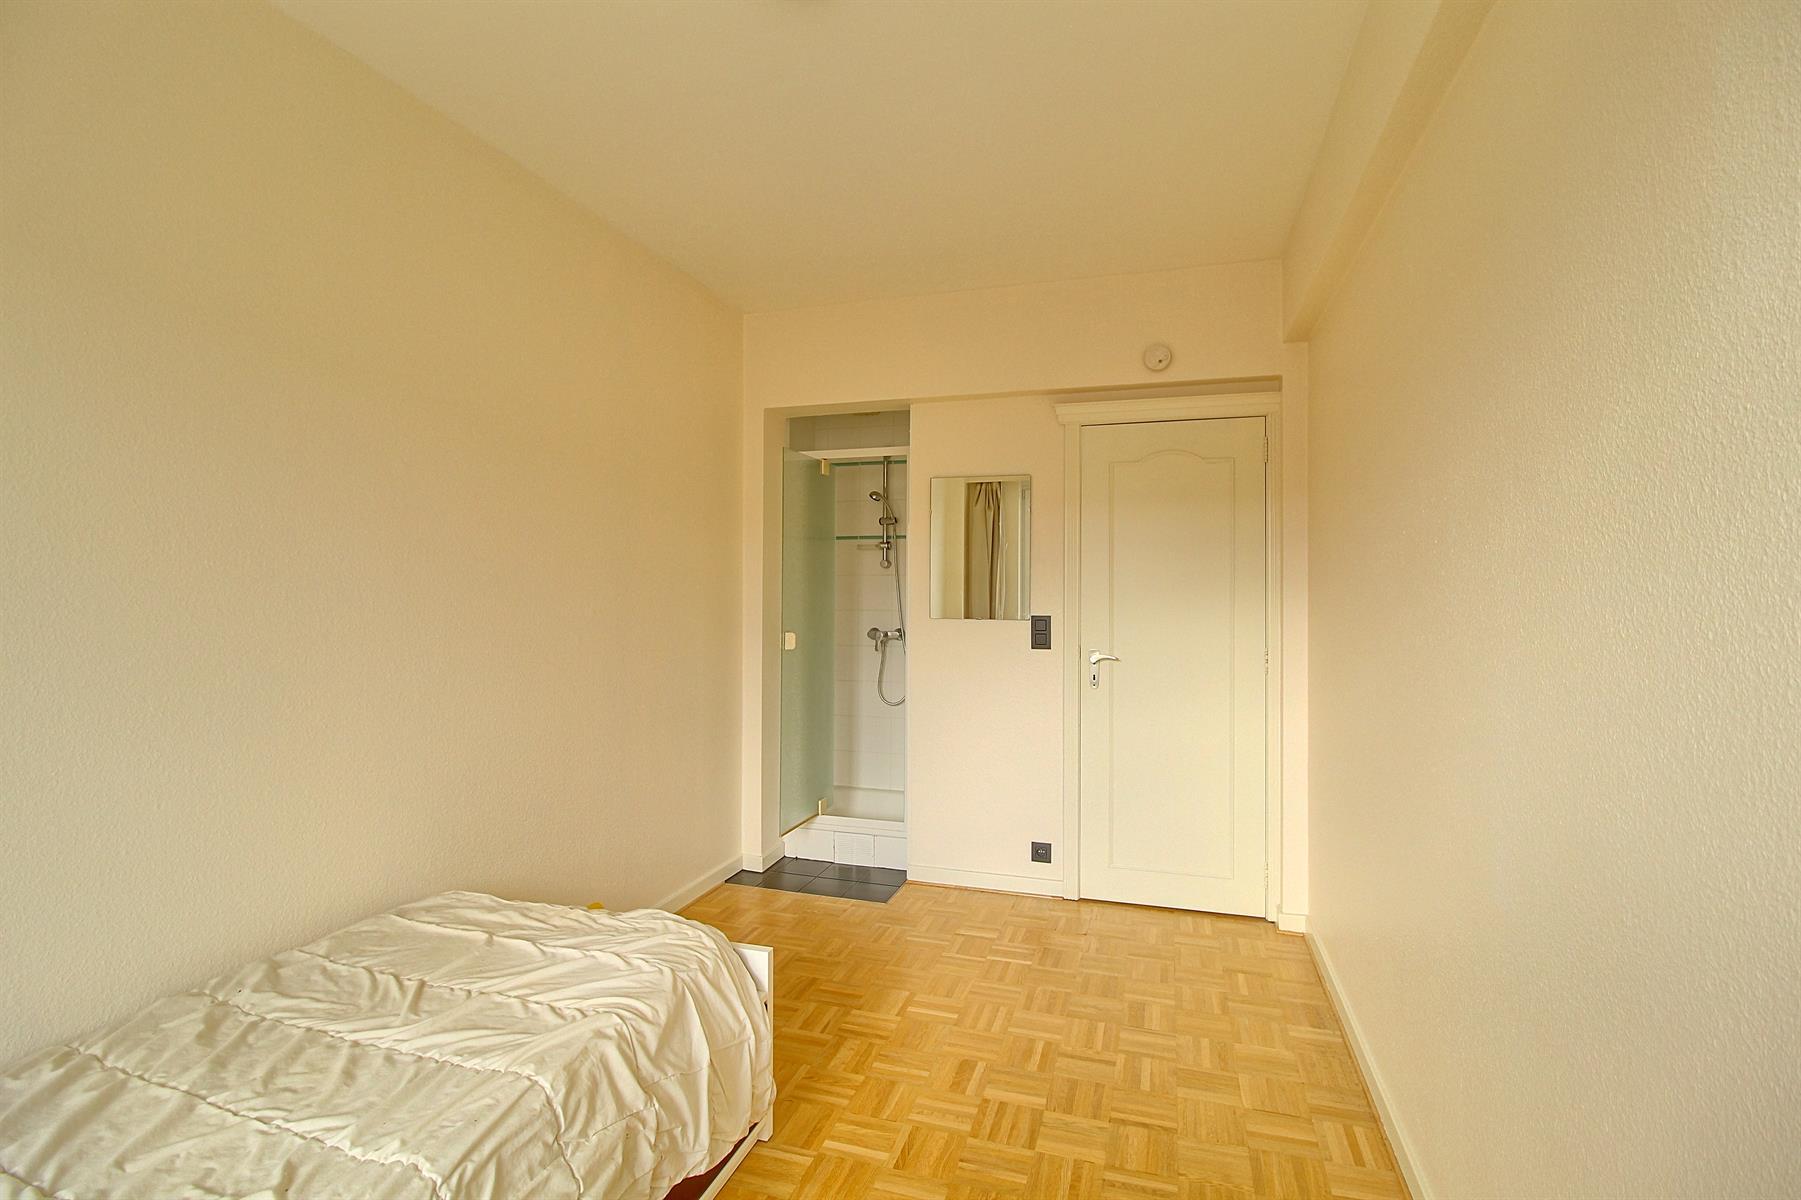 Appartement - Woluwe-Saint-Lambert - #4180127-6